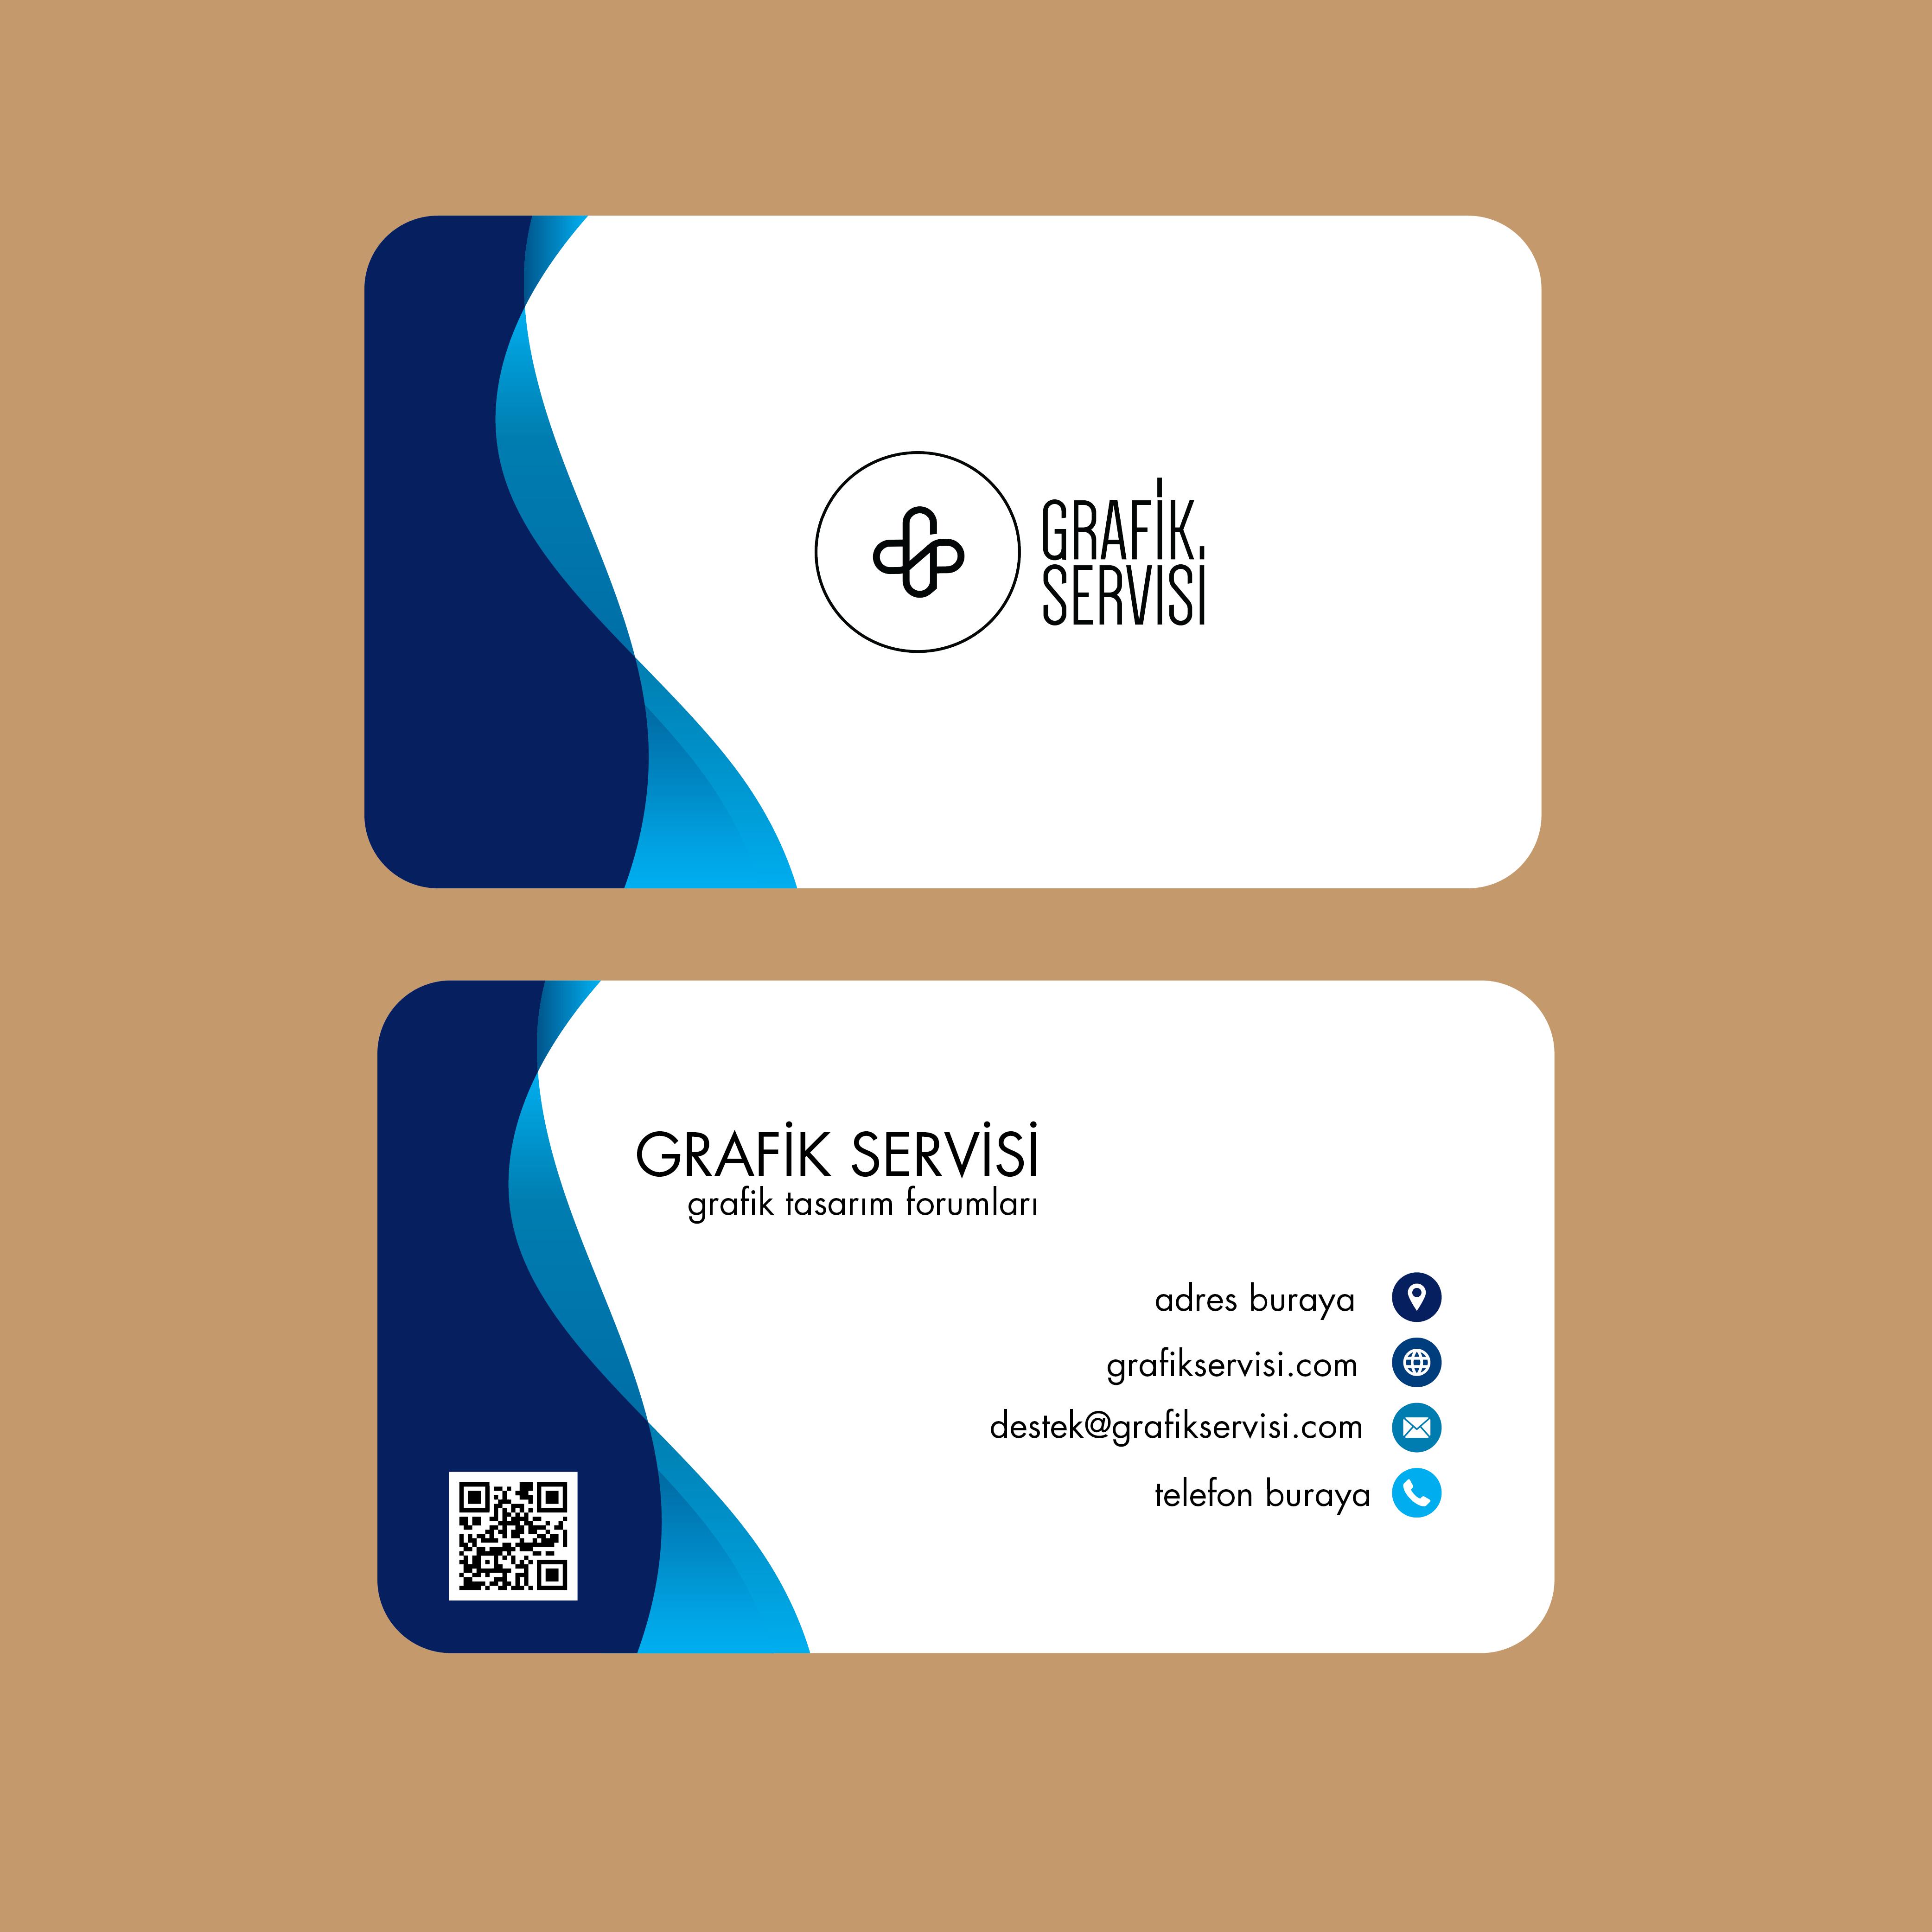 mavi-temiz-kartvizit-31temmuz.png